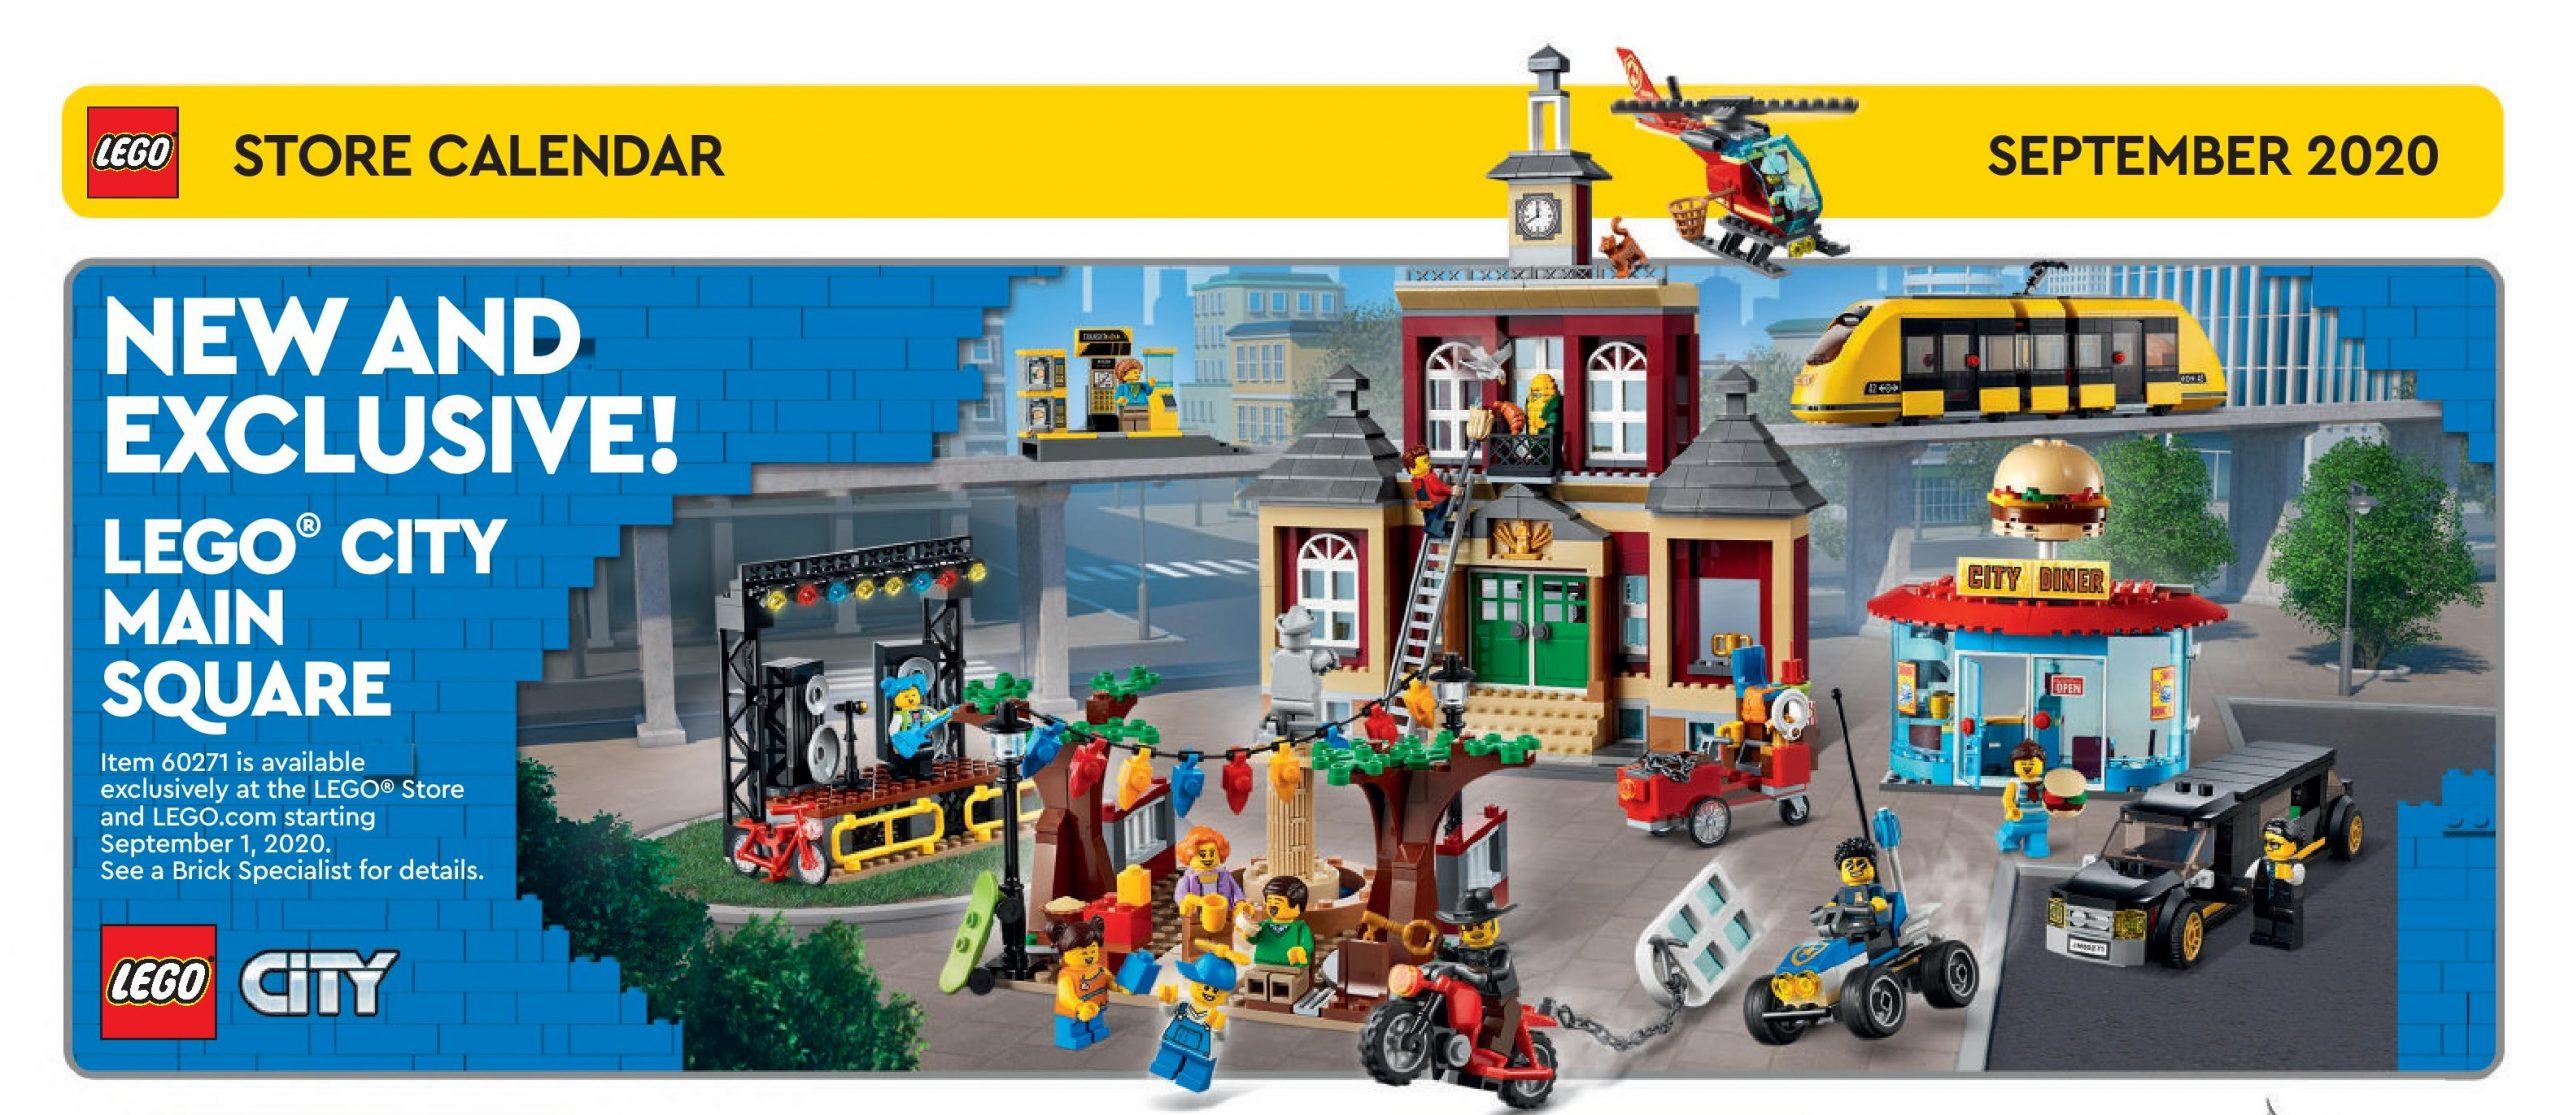 Lego Calendar September 2022.Lego September 2020 Store Calendar Promotions Events The Brick Fan